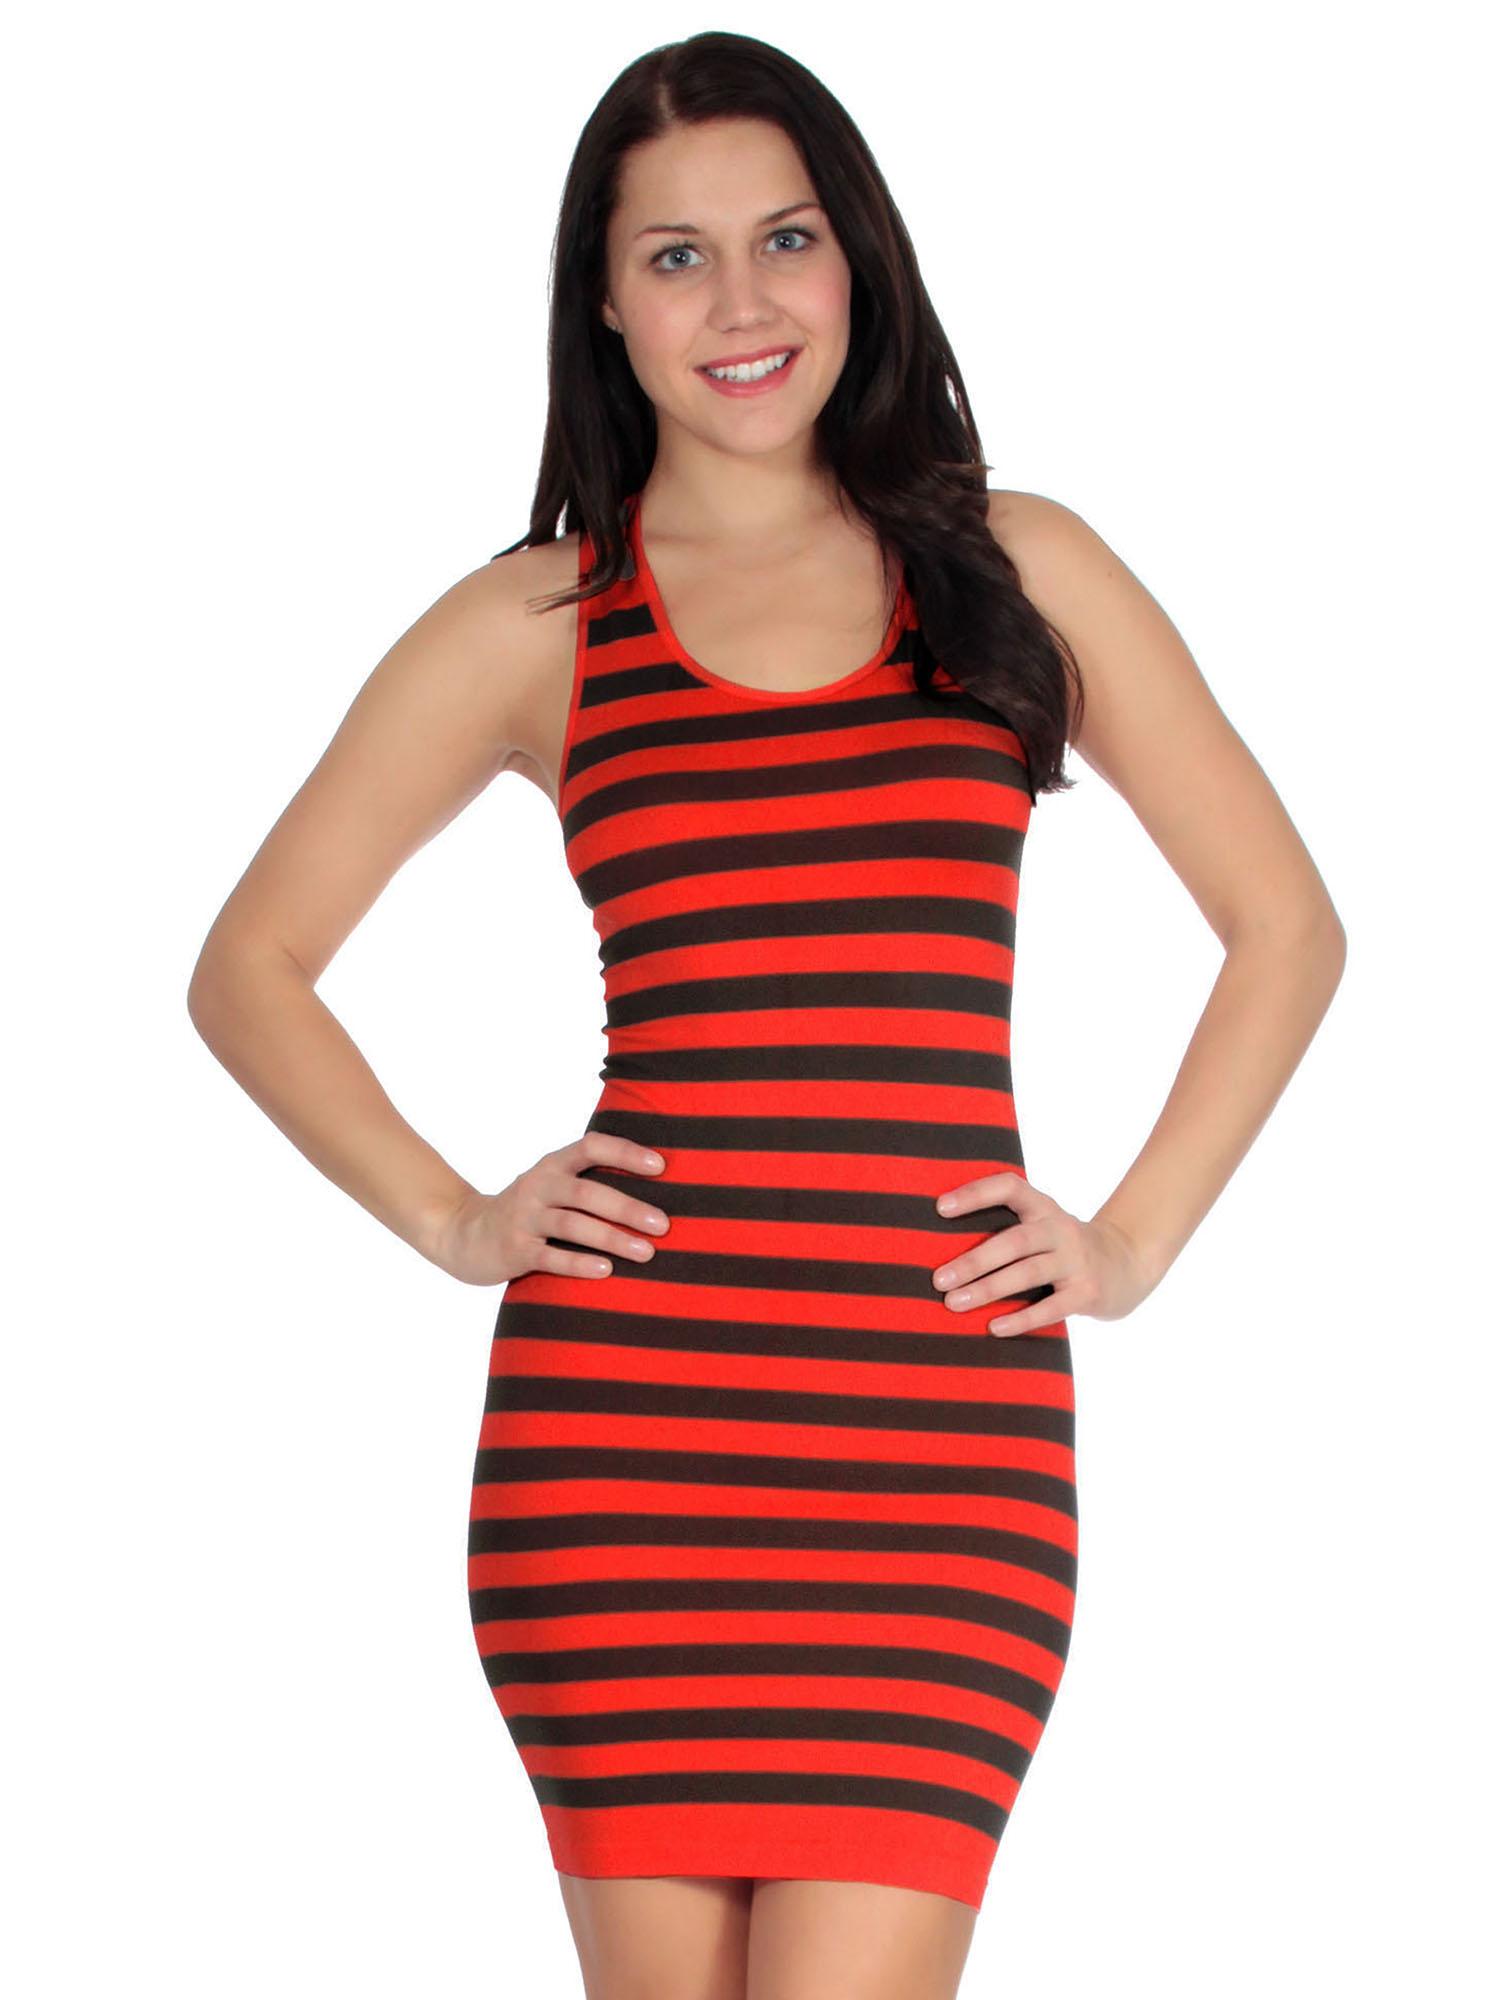 e76b06ecac91 Simplicity - striped mini tank dress in seamless stretch fit fibers -  Walmart.com